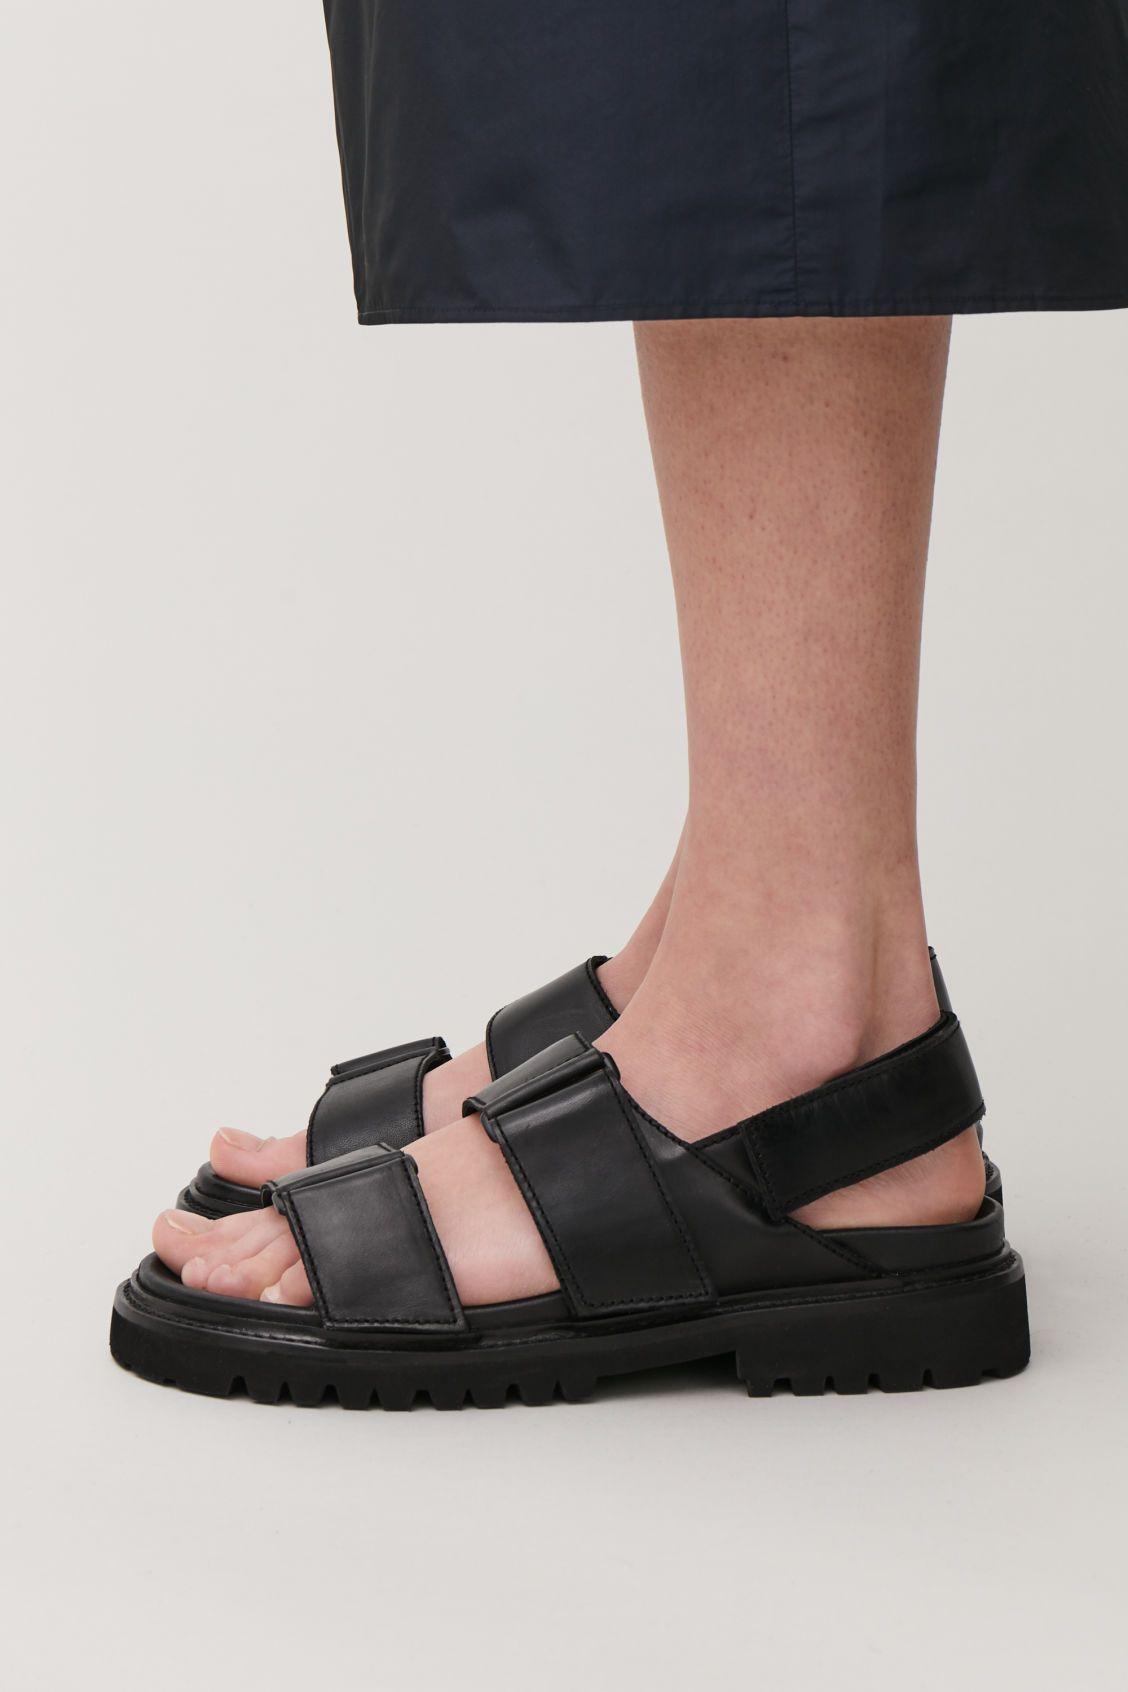 6b6de0b16da Clarks ROMANTIC MOON - Sandals - gold for £39.99 (16 06 17) with free  delivery at Zalando